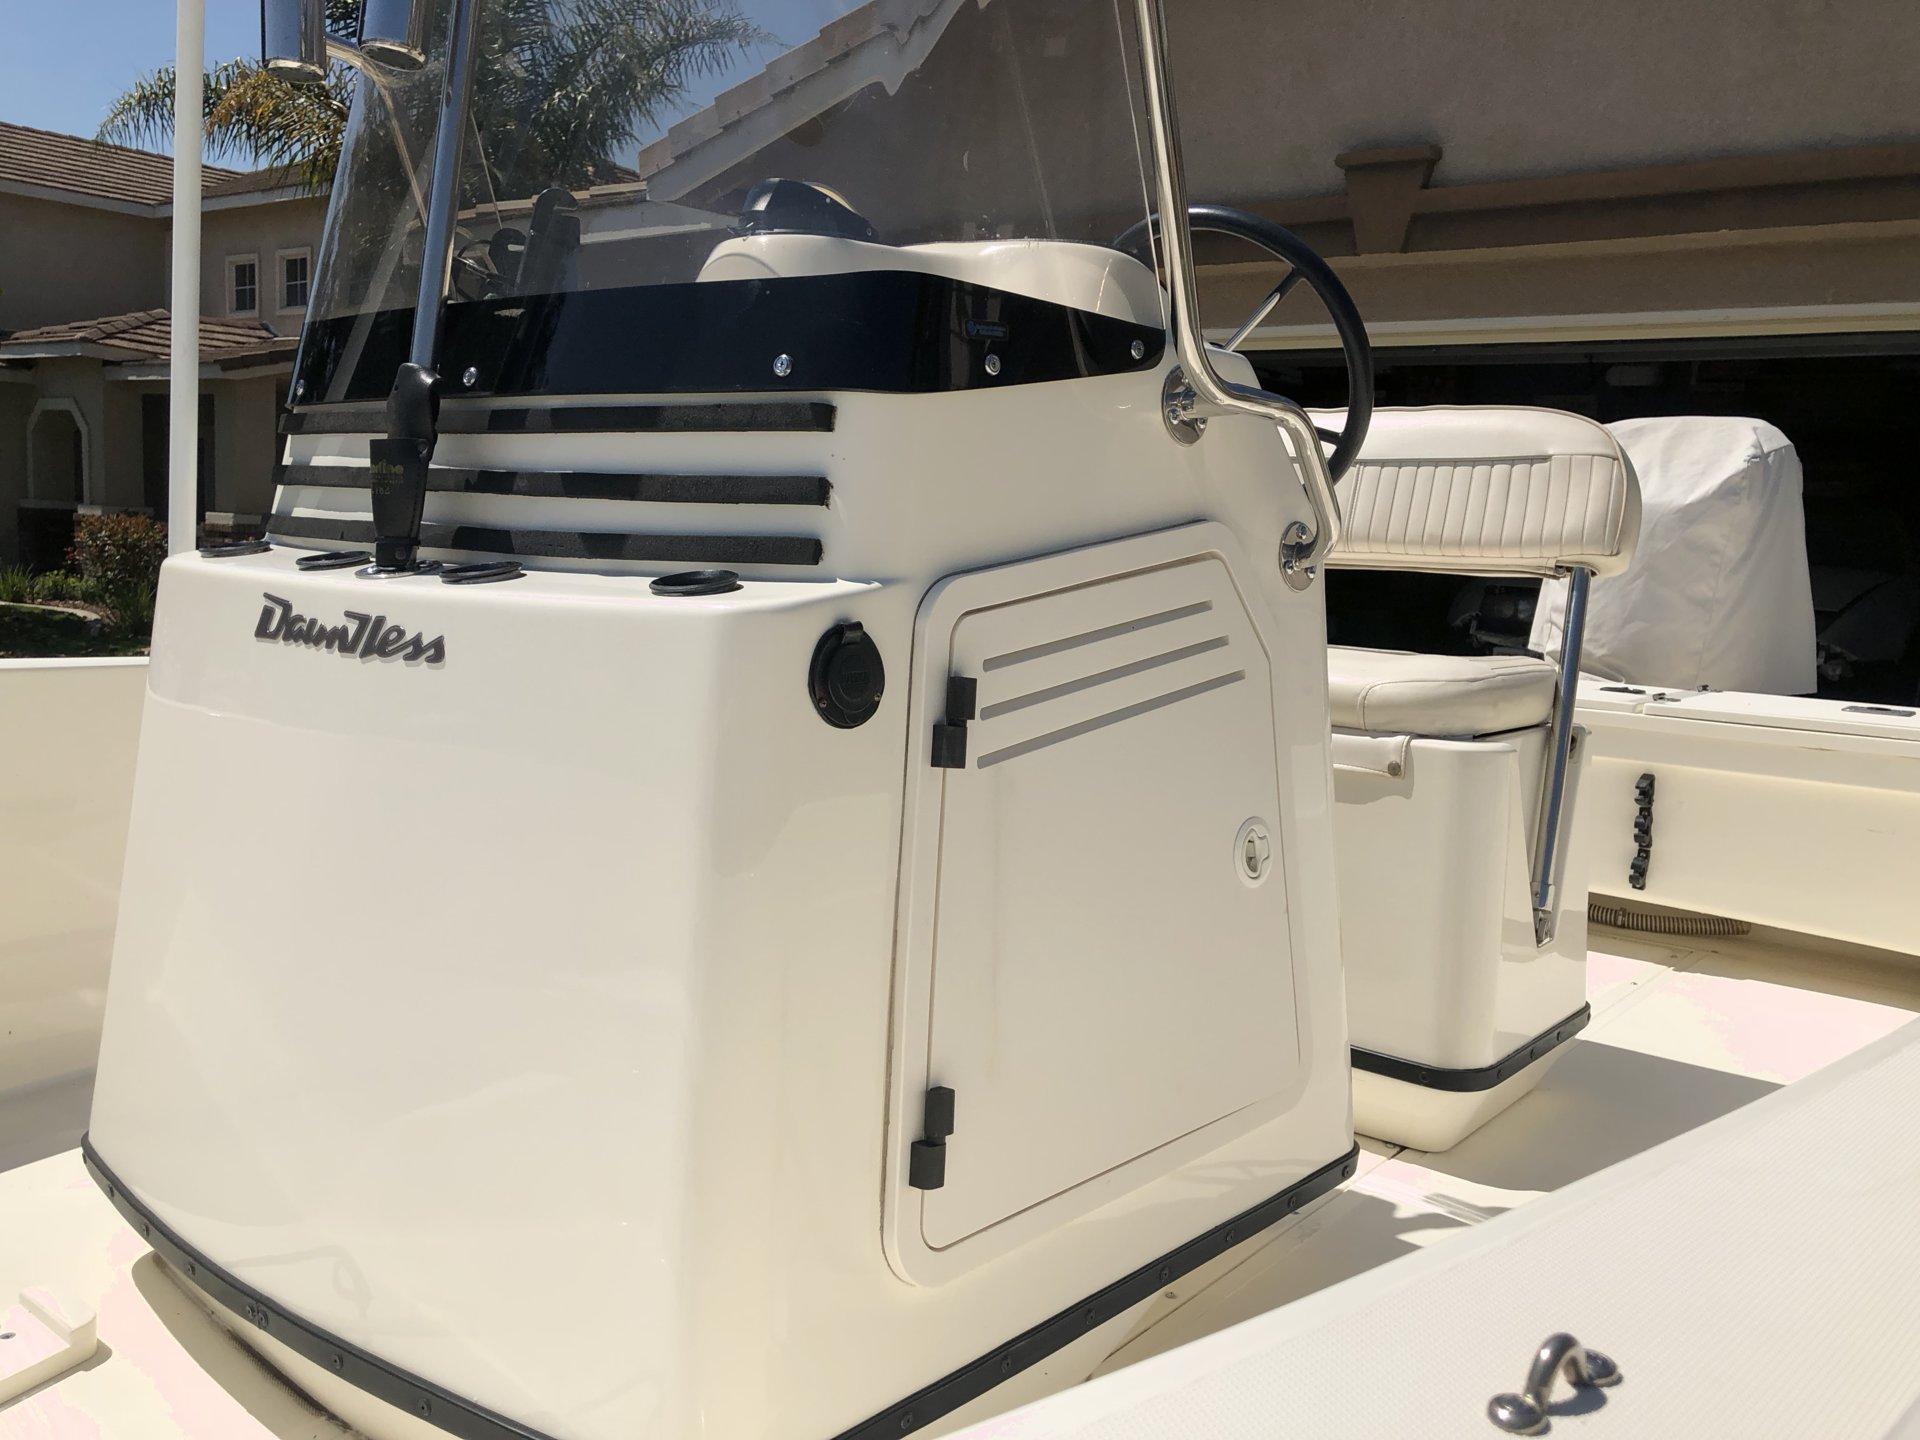 For Sale - Boston Whaler Dauntless 18 Yamaha SWSII 150